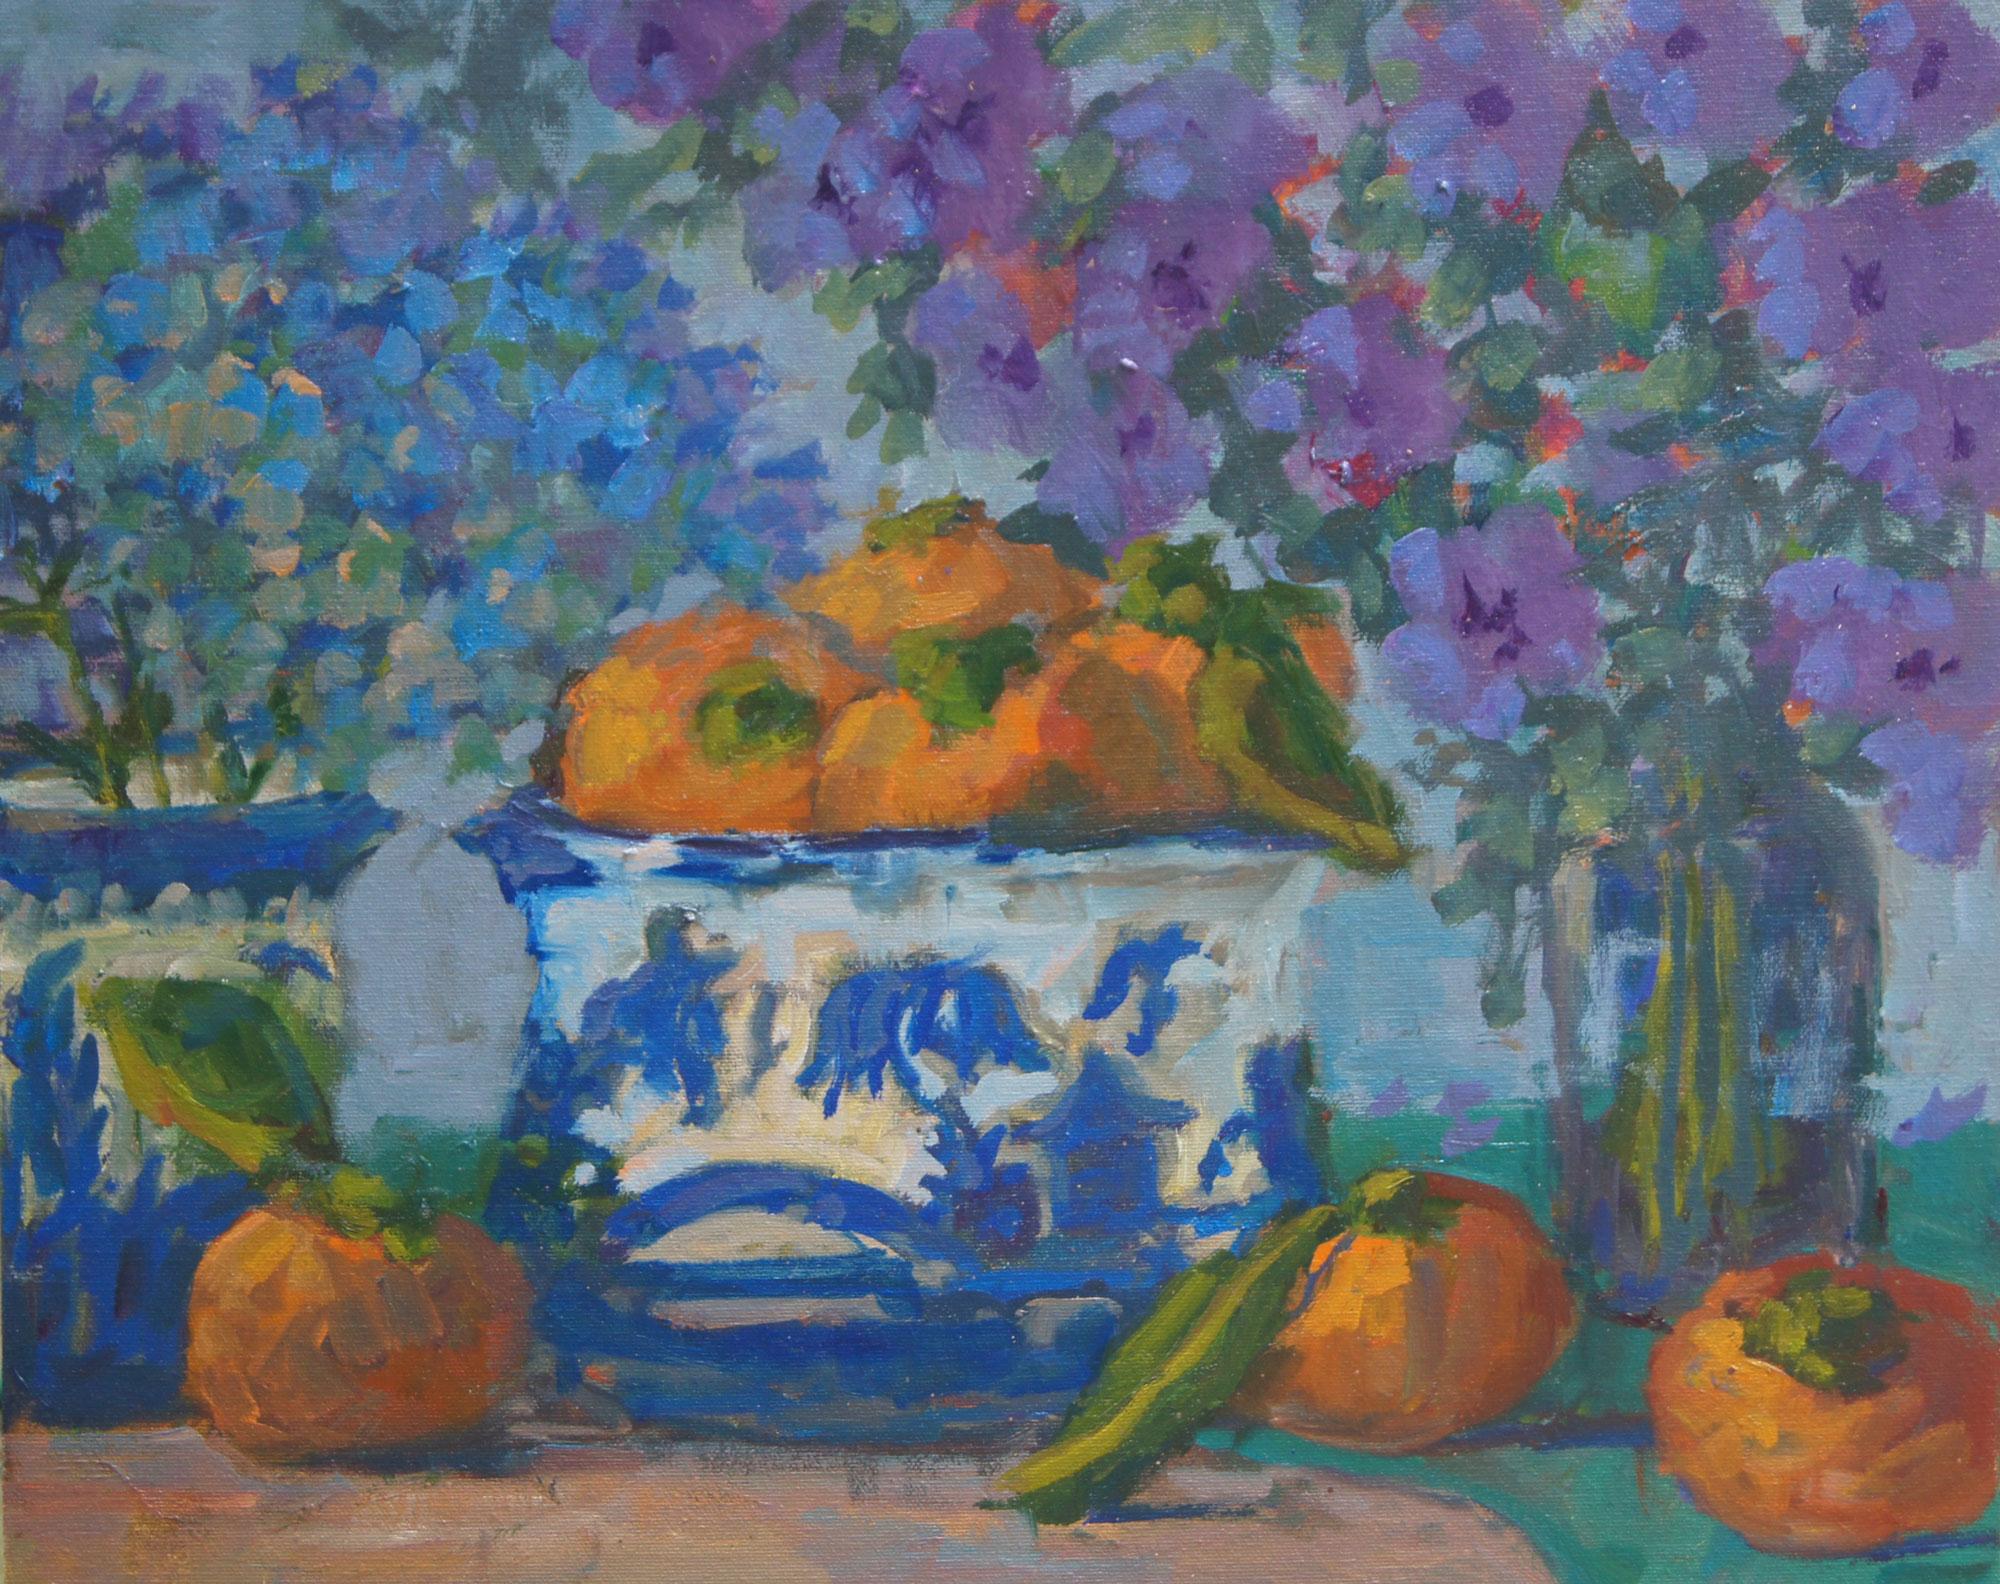 uchizono-blue-willow-persimmons-open-studios.jpg